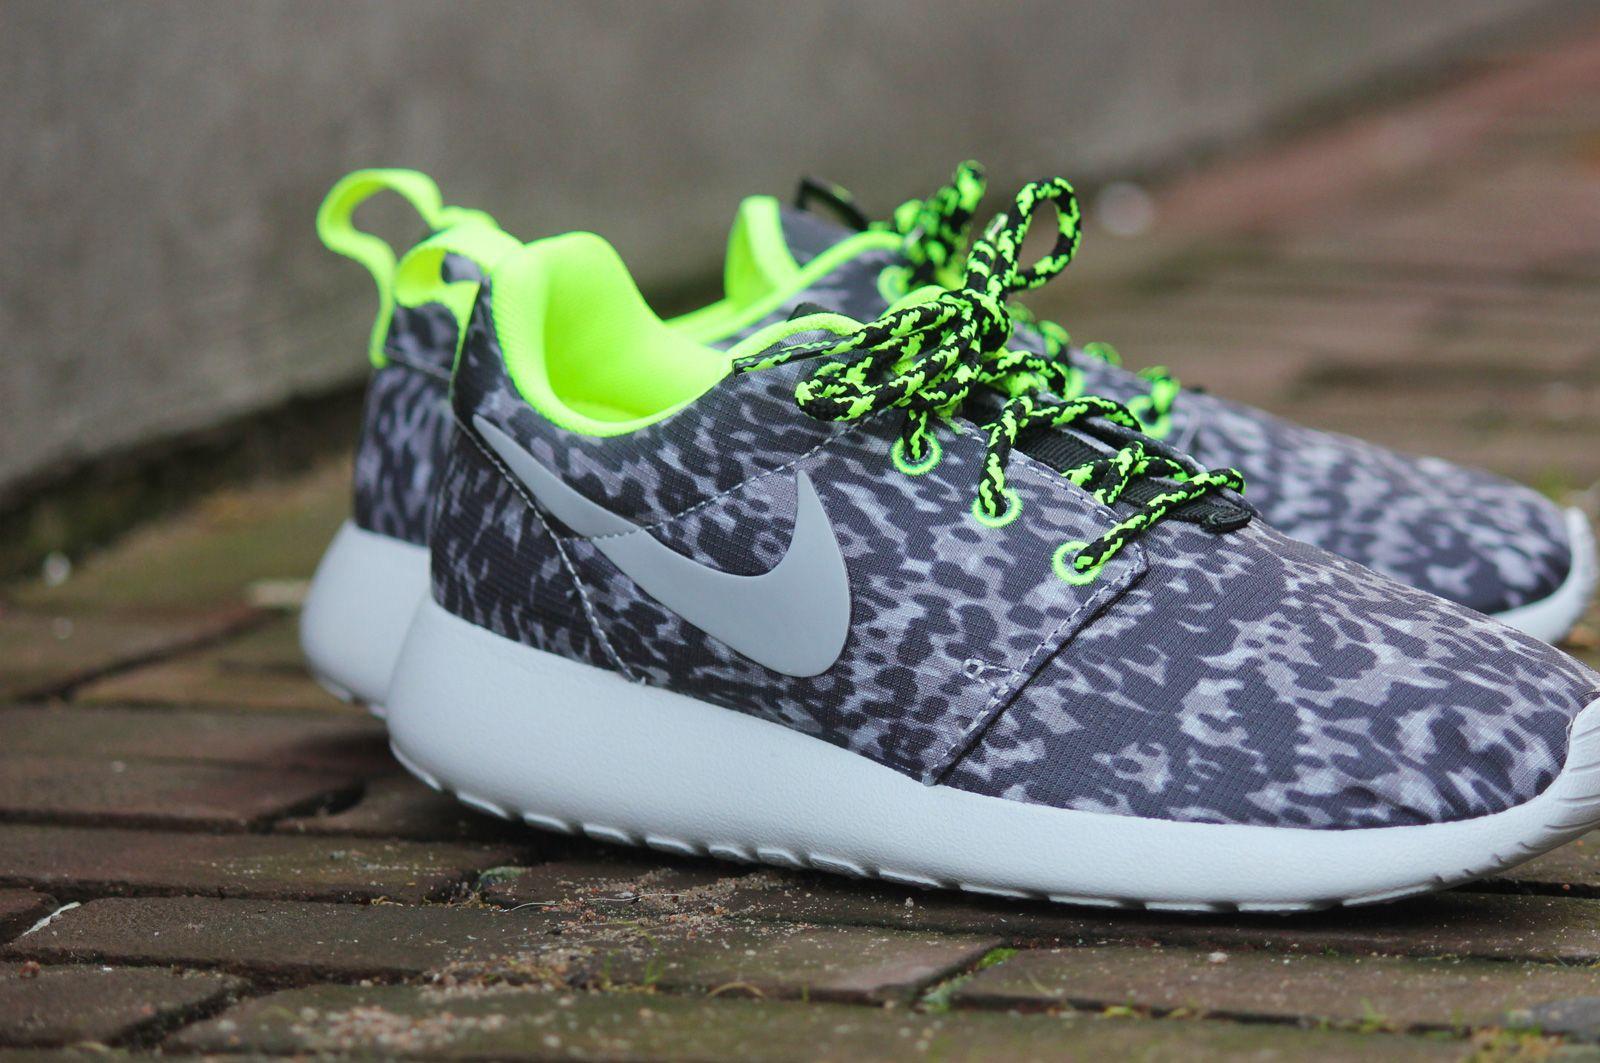 c41d65cd56aa Nike Rosherun Print Cool Grey   Volt - 599432-070